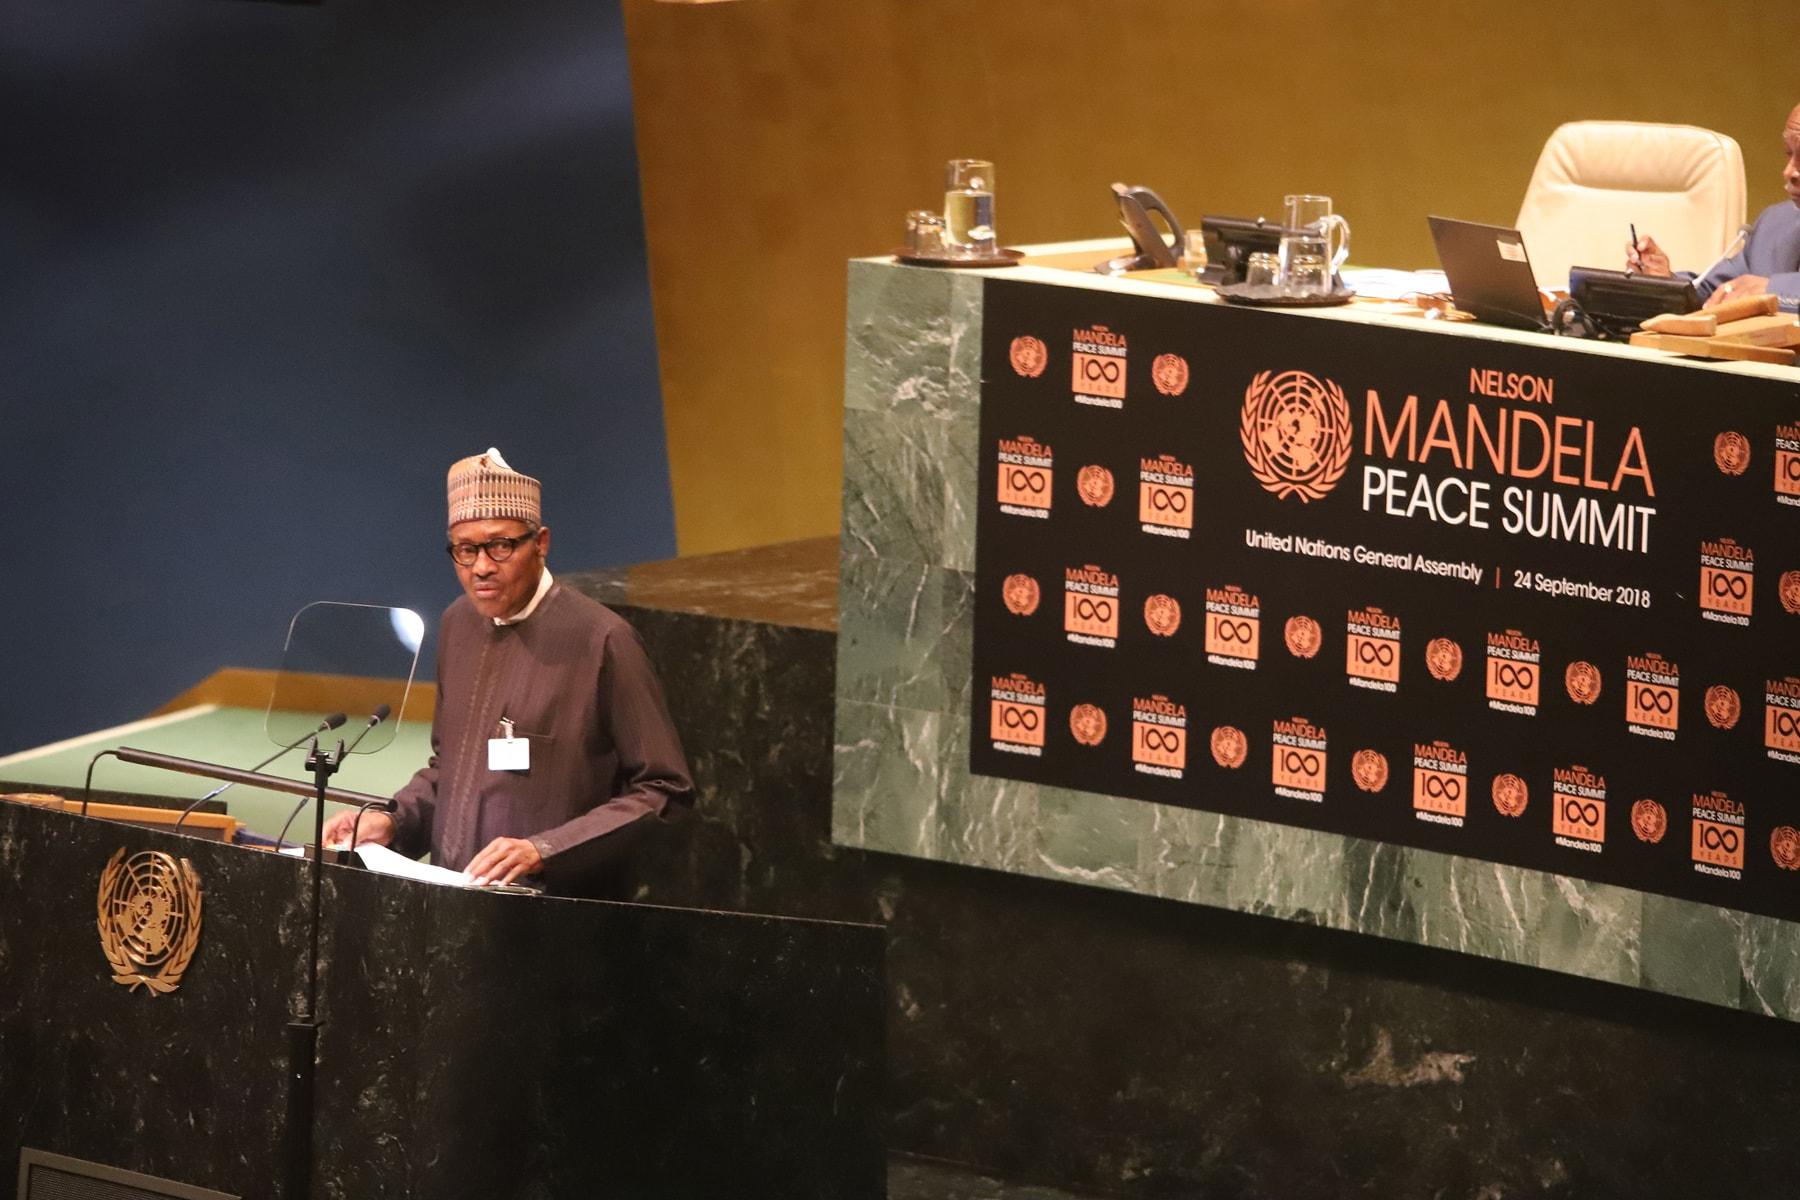 President Buhari Extols Nelson Mandela's Virtues, Condemns Discrimination